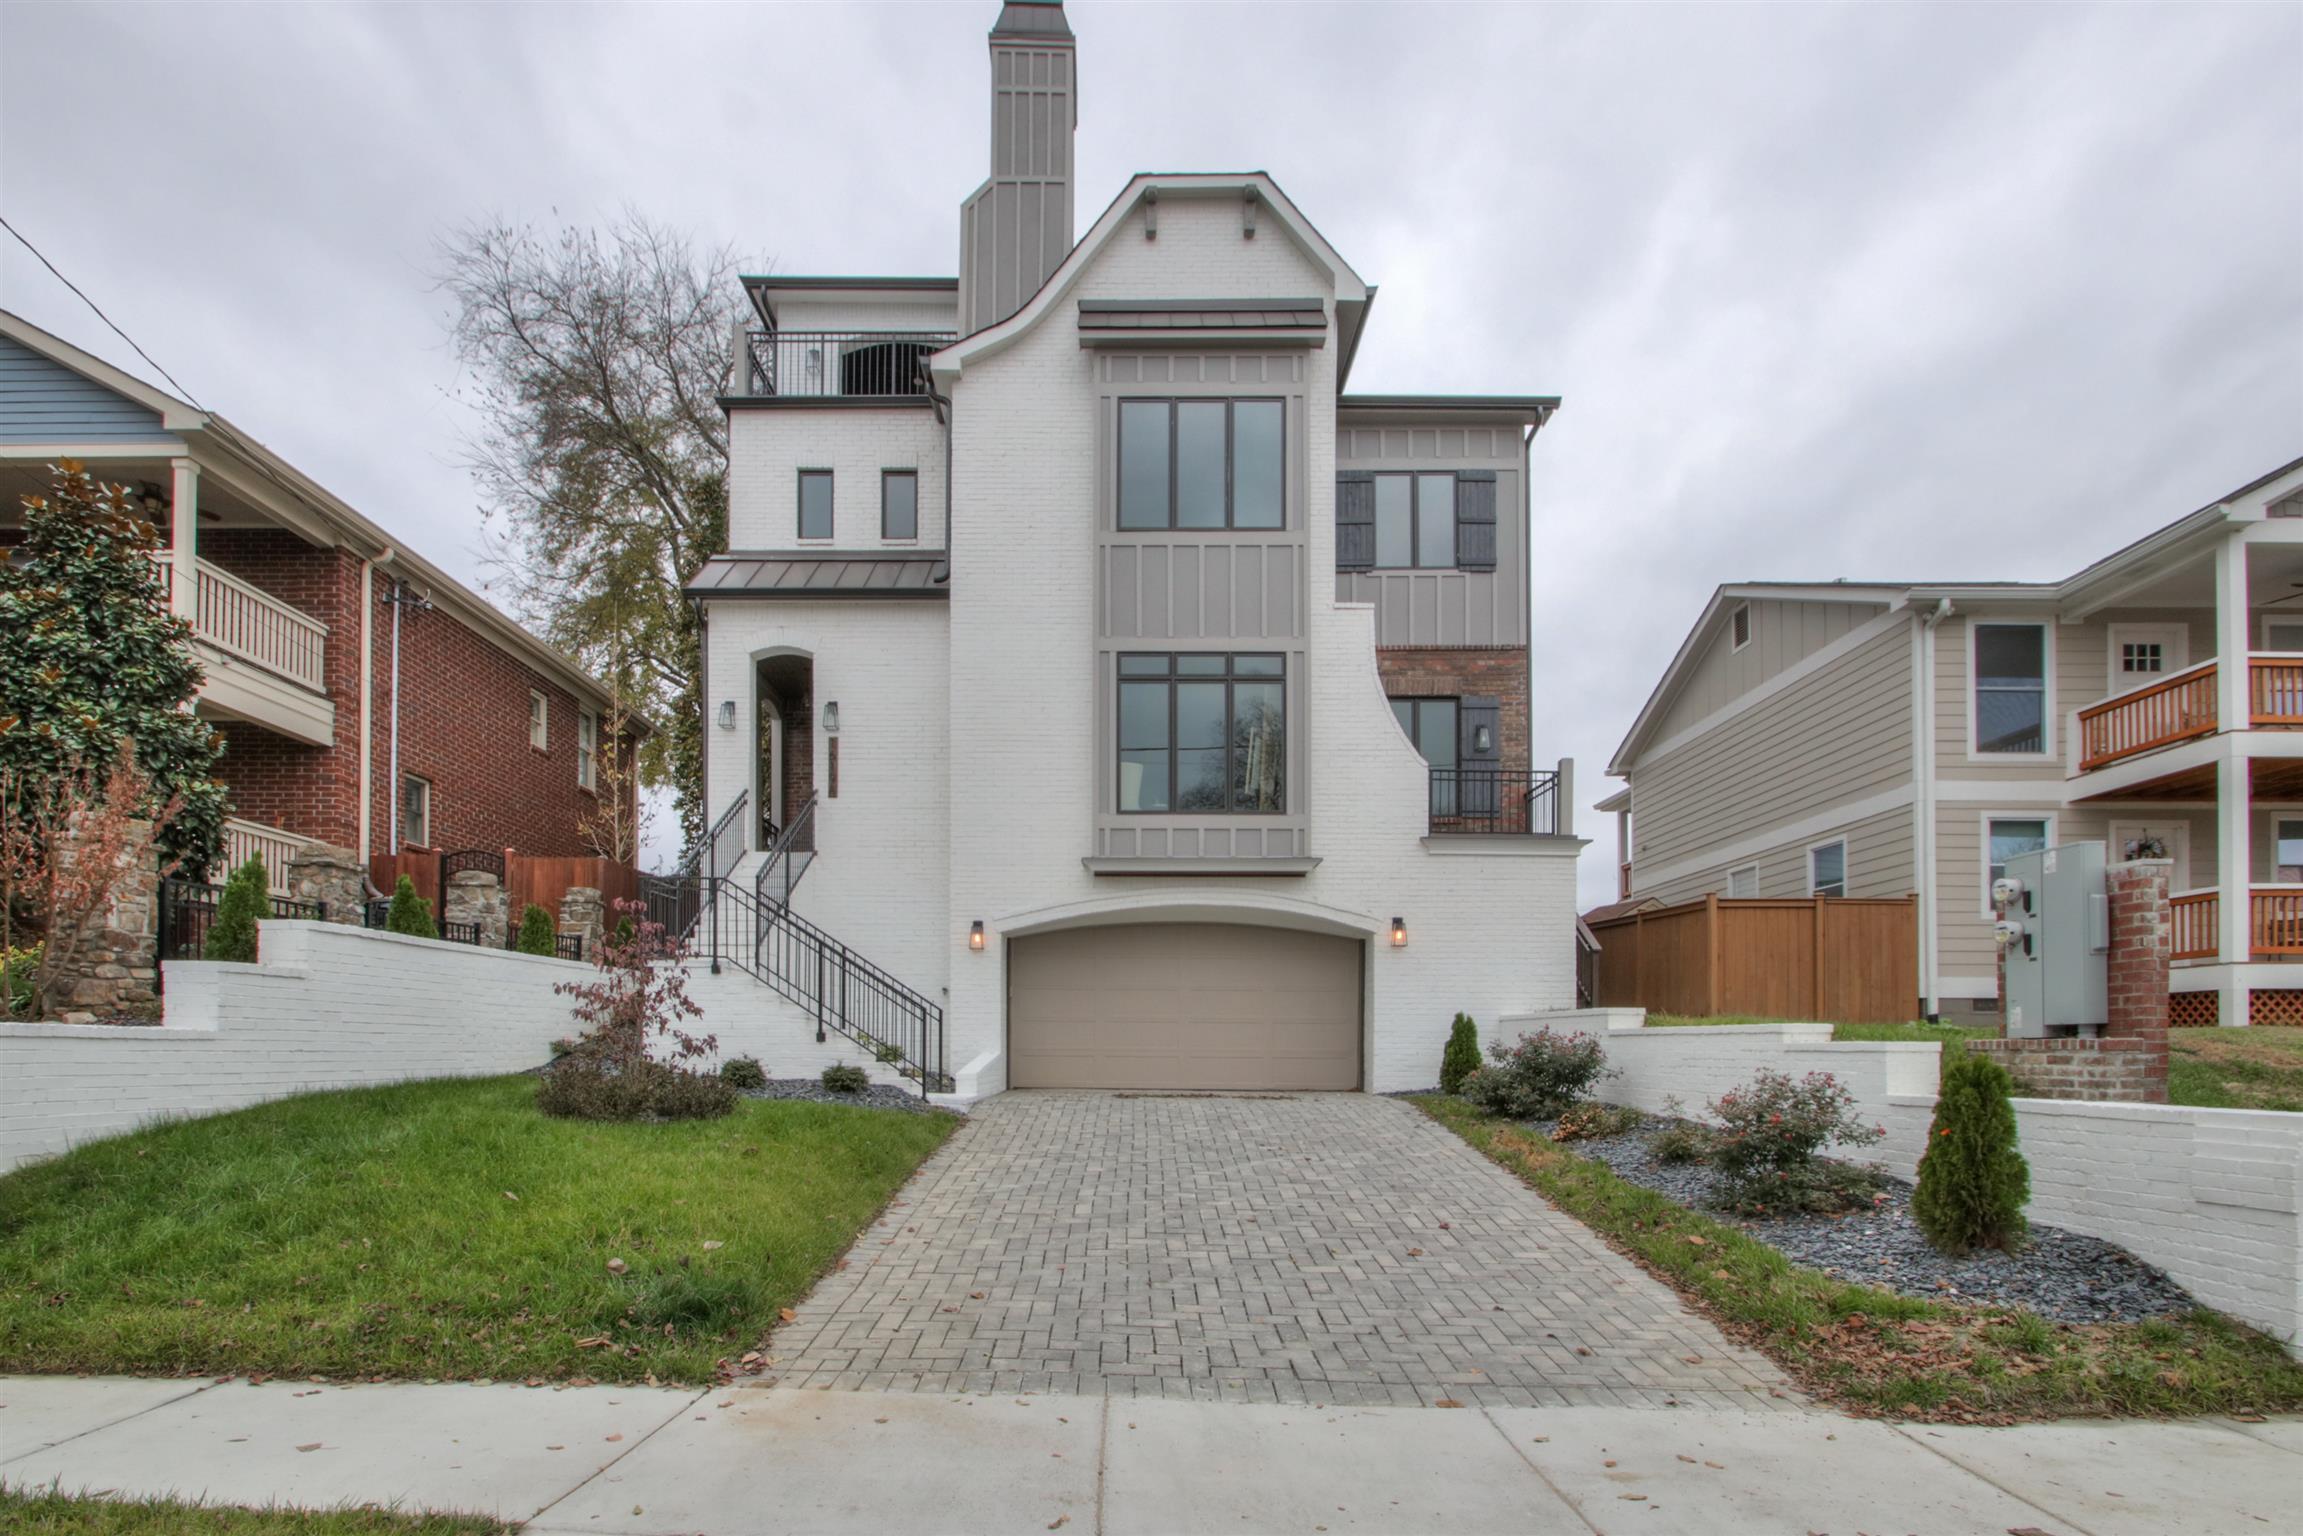 1619A 7Th Ave , N, Nashville, TN 37208 - Nashville, TN real estate listing